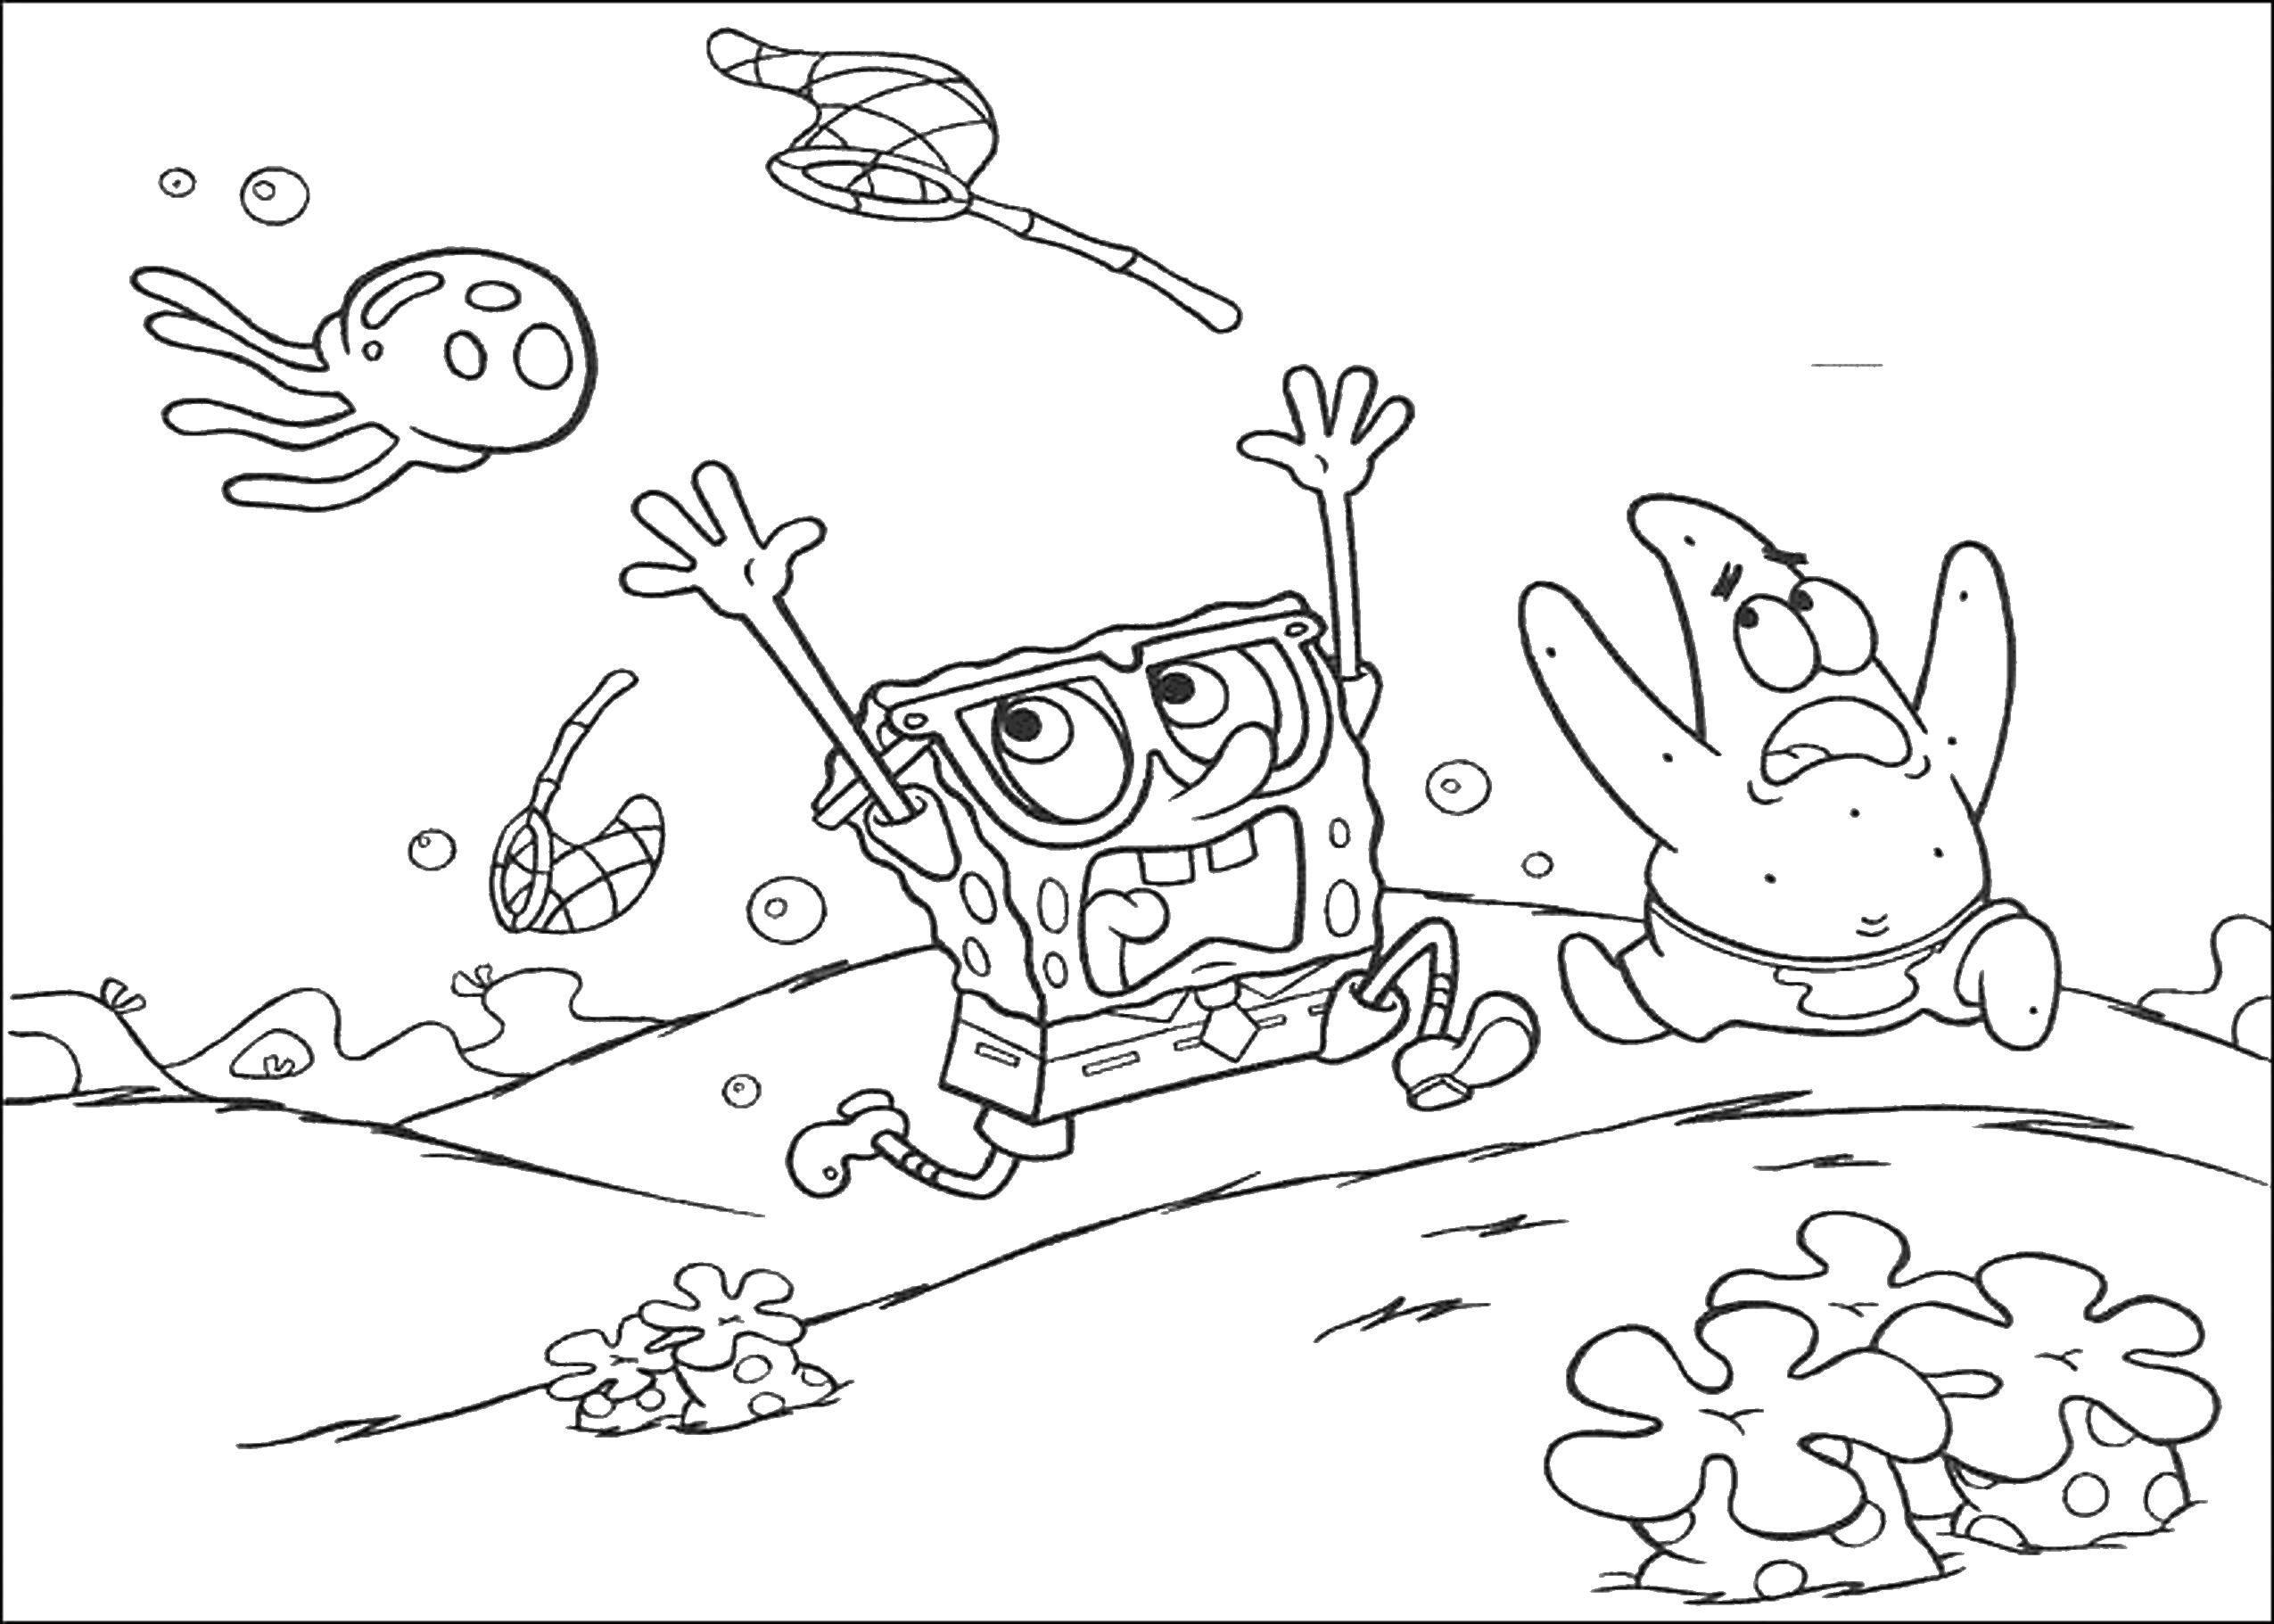 Раскраска Спанч боб, патрик и медуза Скачать Спанч Боб, Патрик, медуза.  Распечатать ,Спанч Боб,